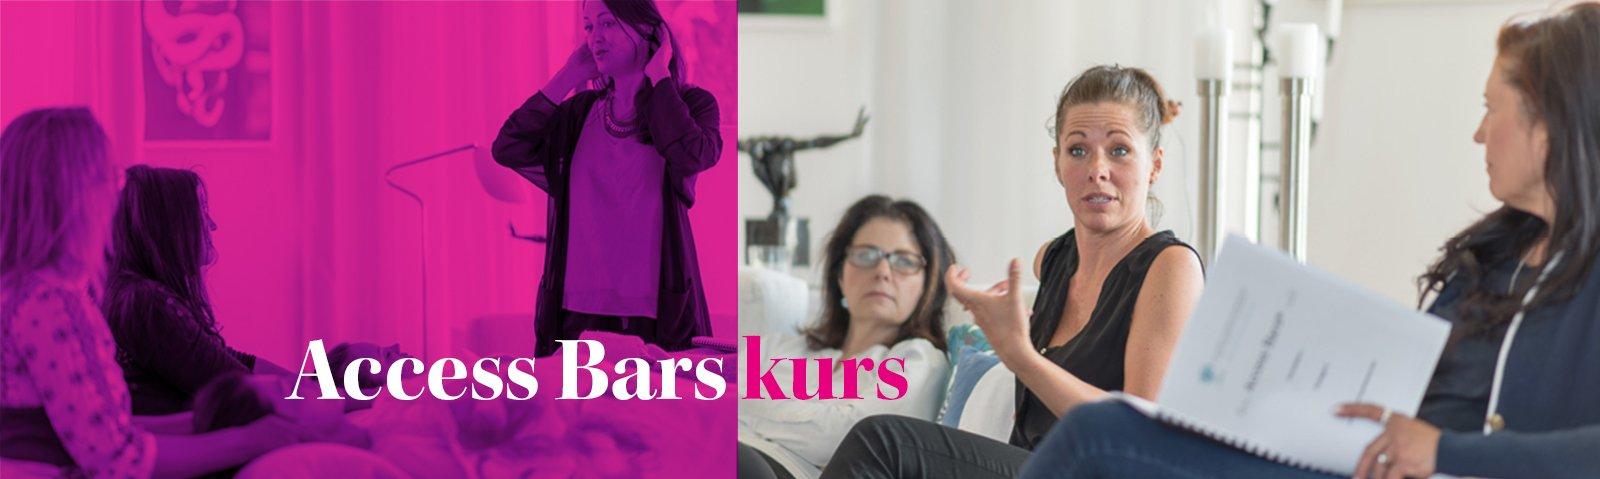 Access Bars kurs